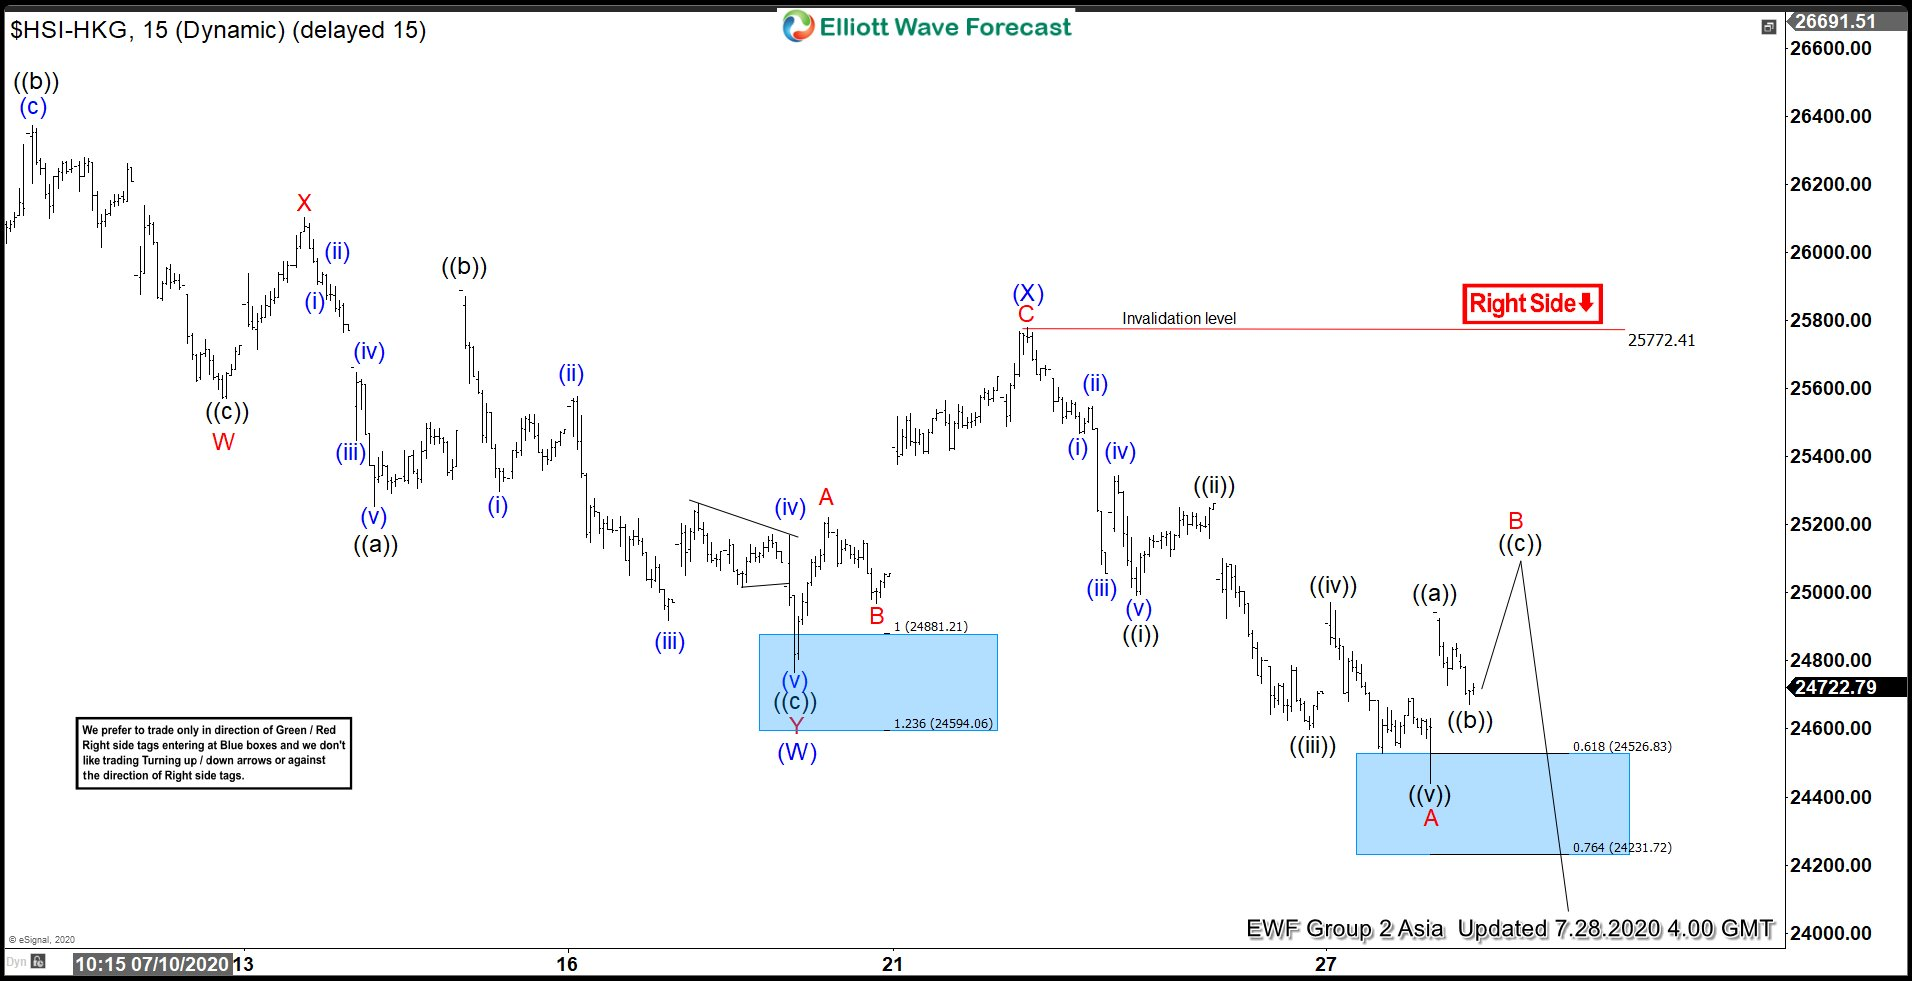 Elliott Wave View: Hang Seng Index Correction In Progress